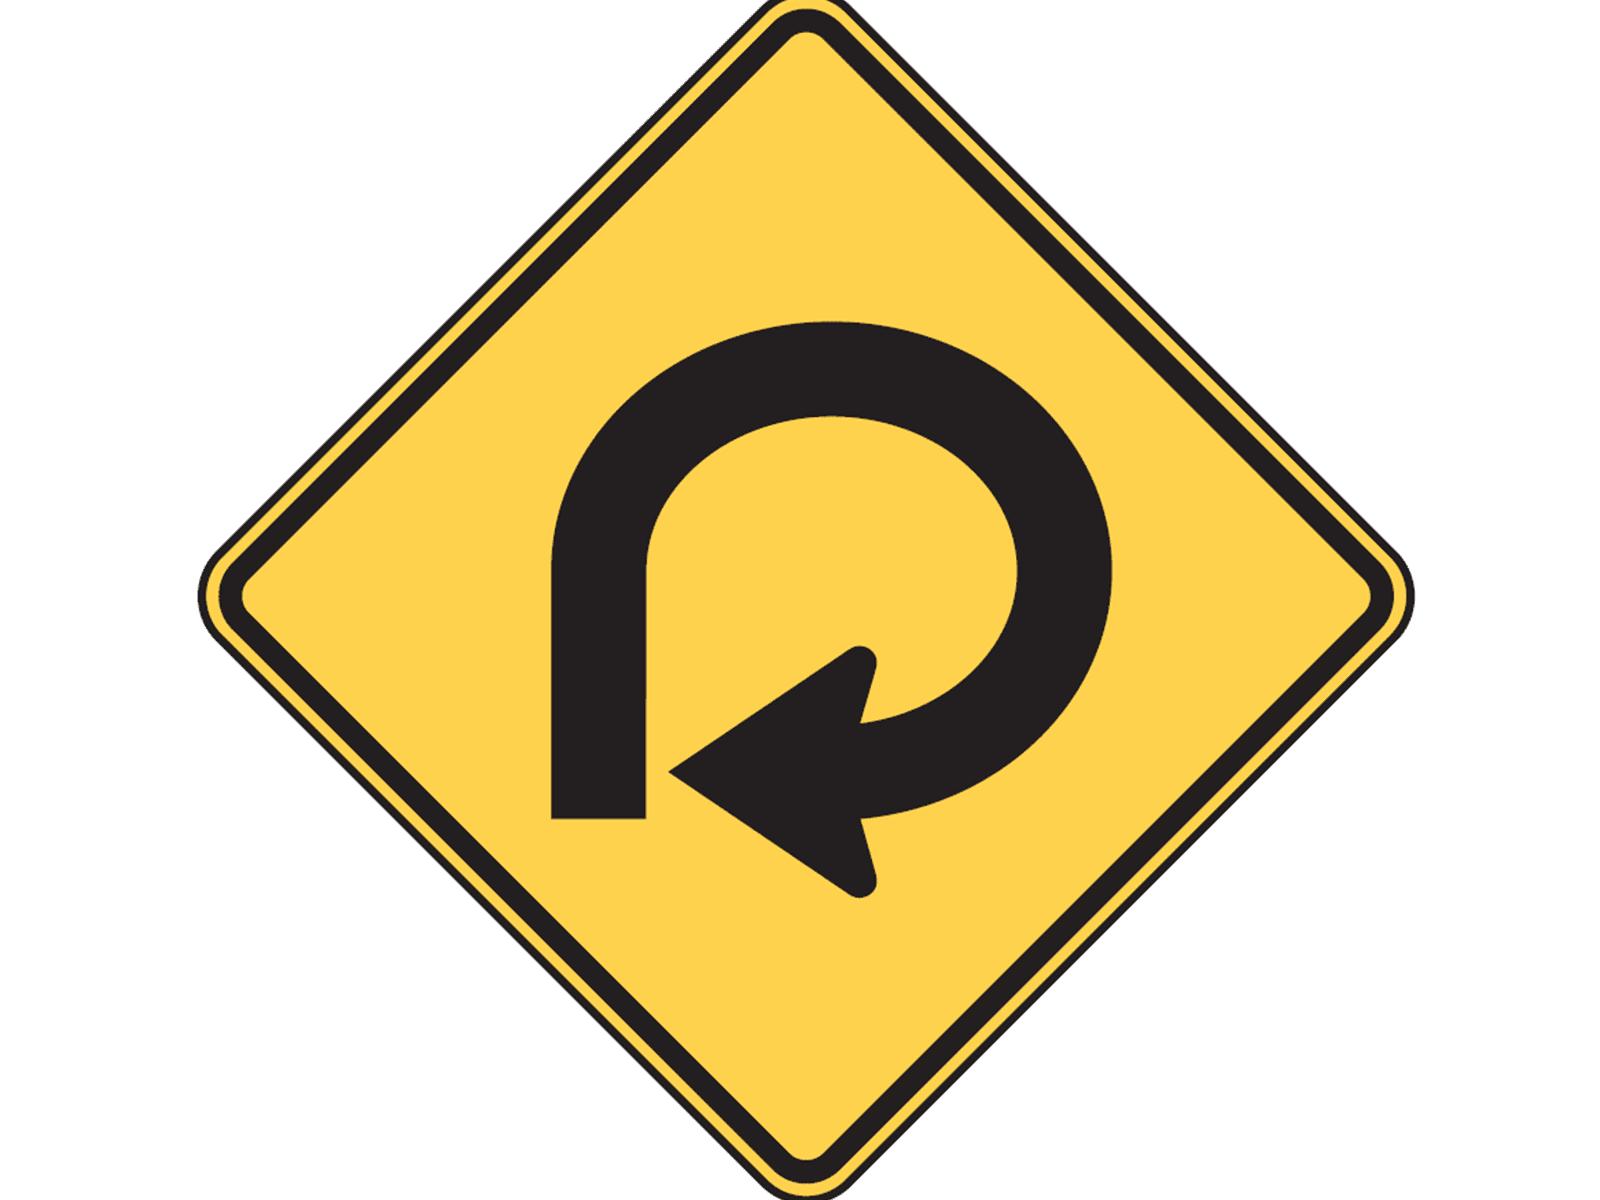 Dmv One Way Sign Degree Curve W1 15